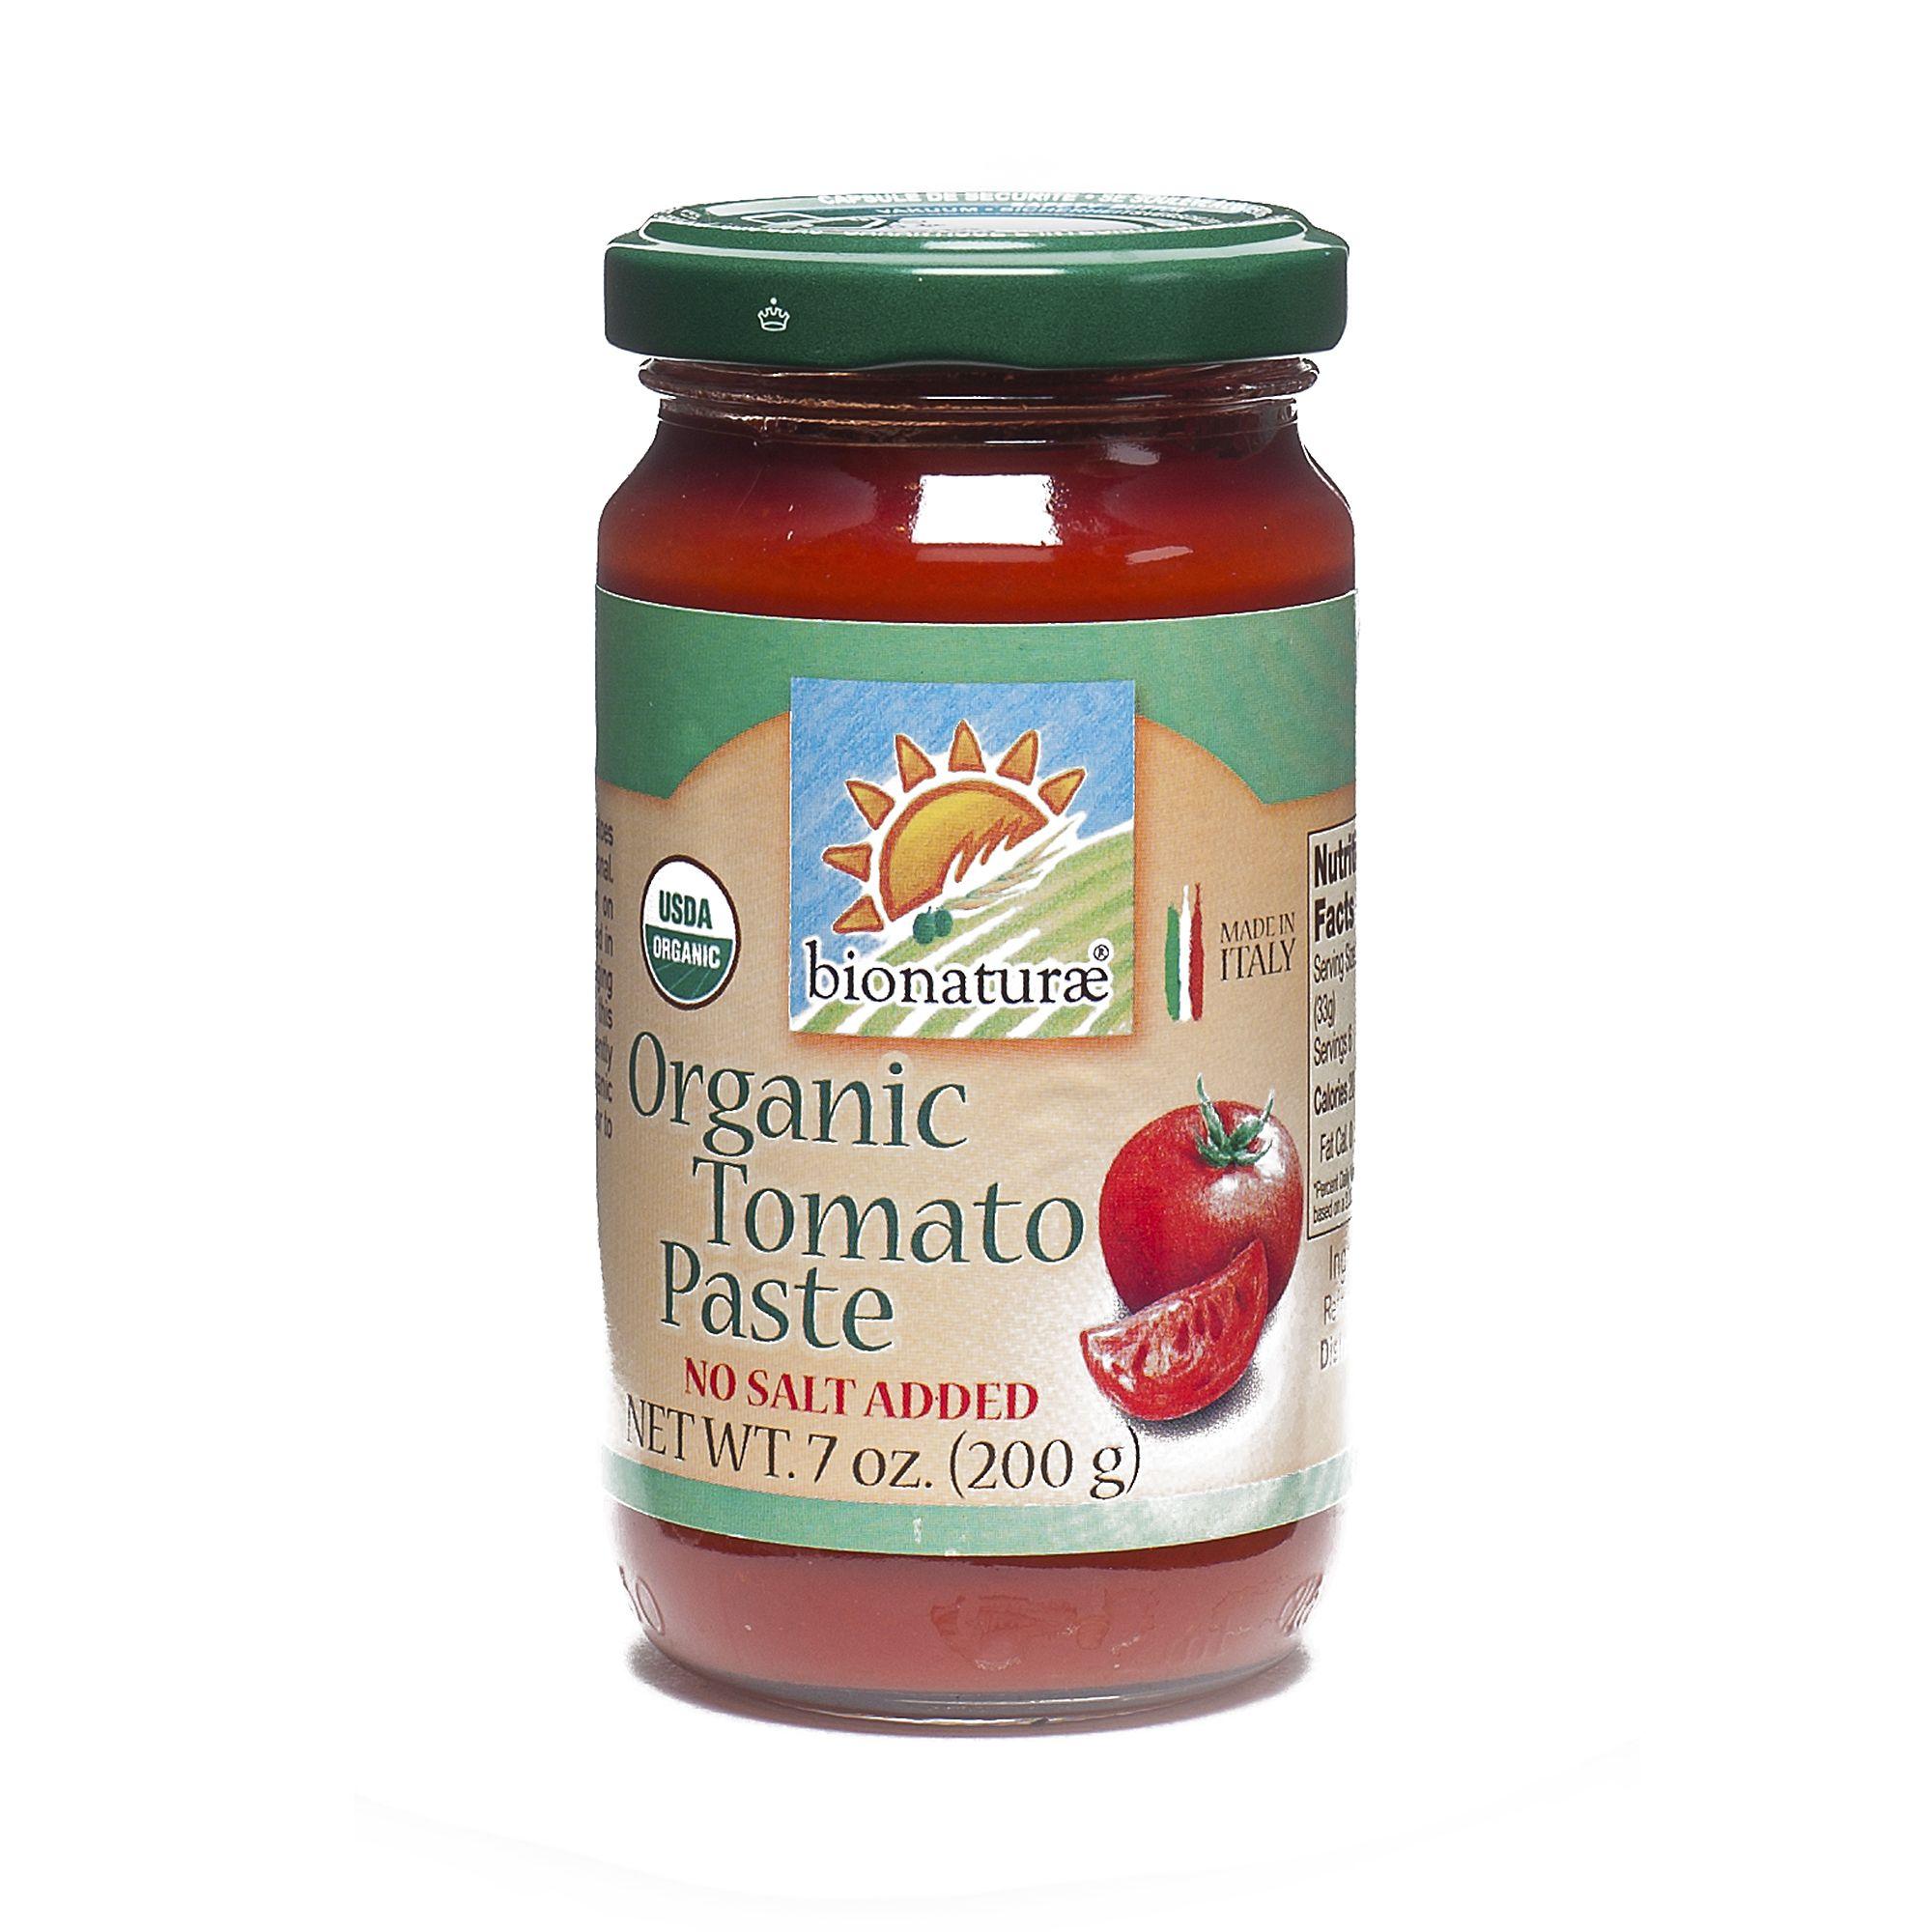 Bionaturae organic tomato paste organic recipes organic